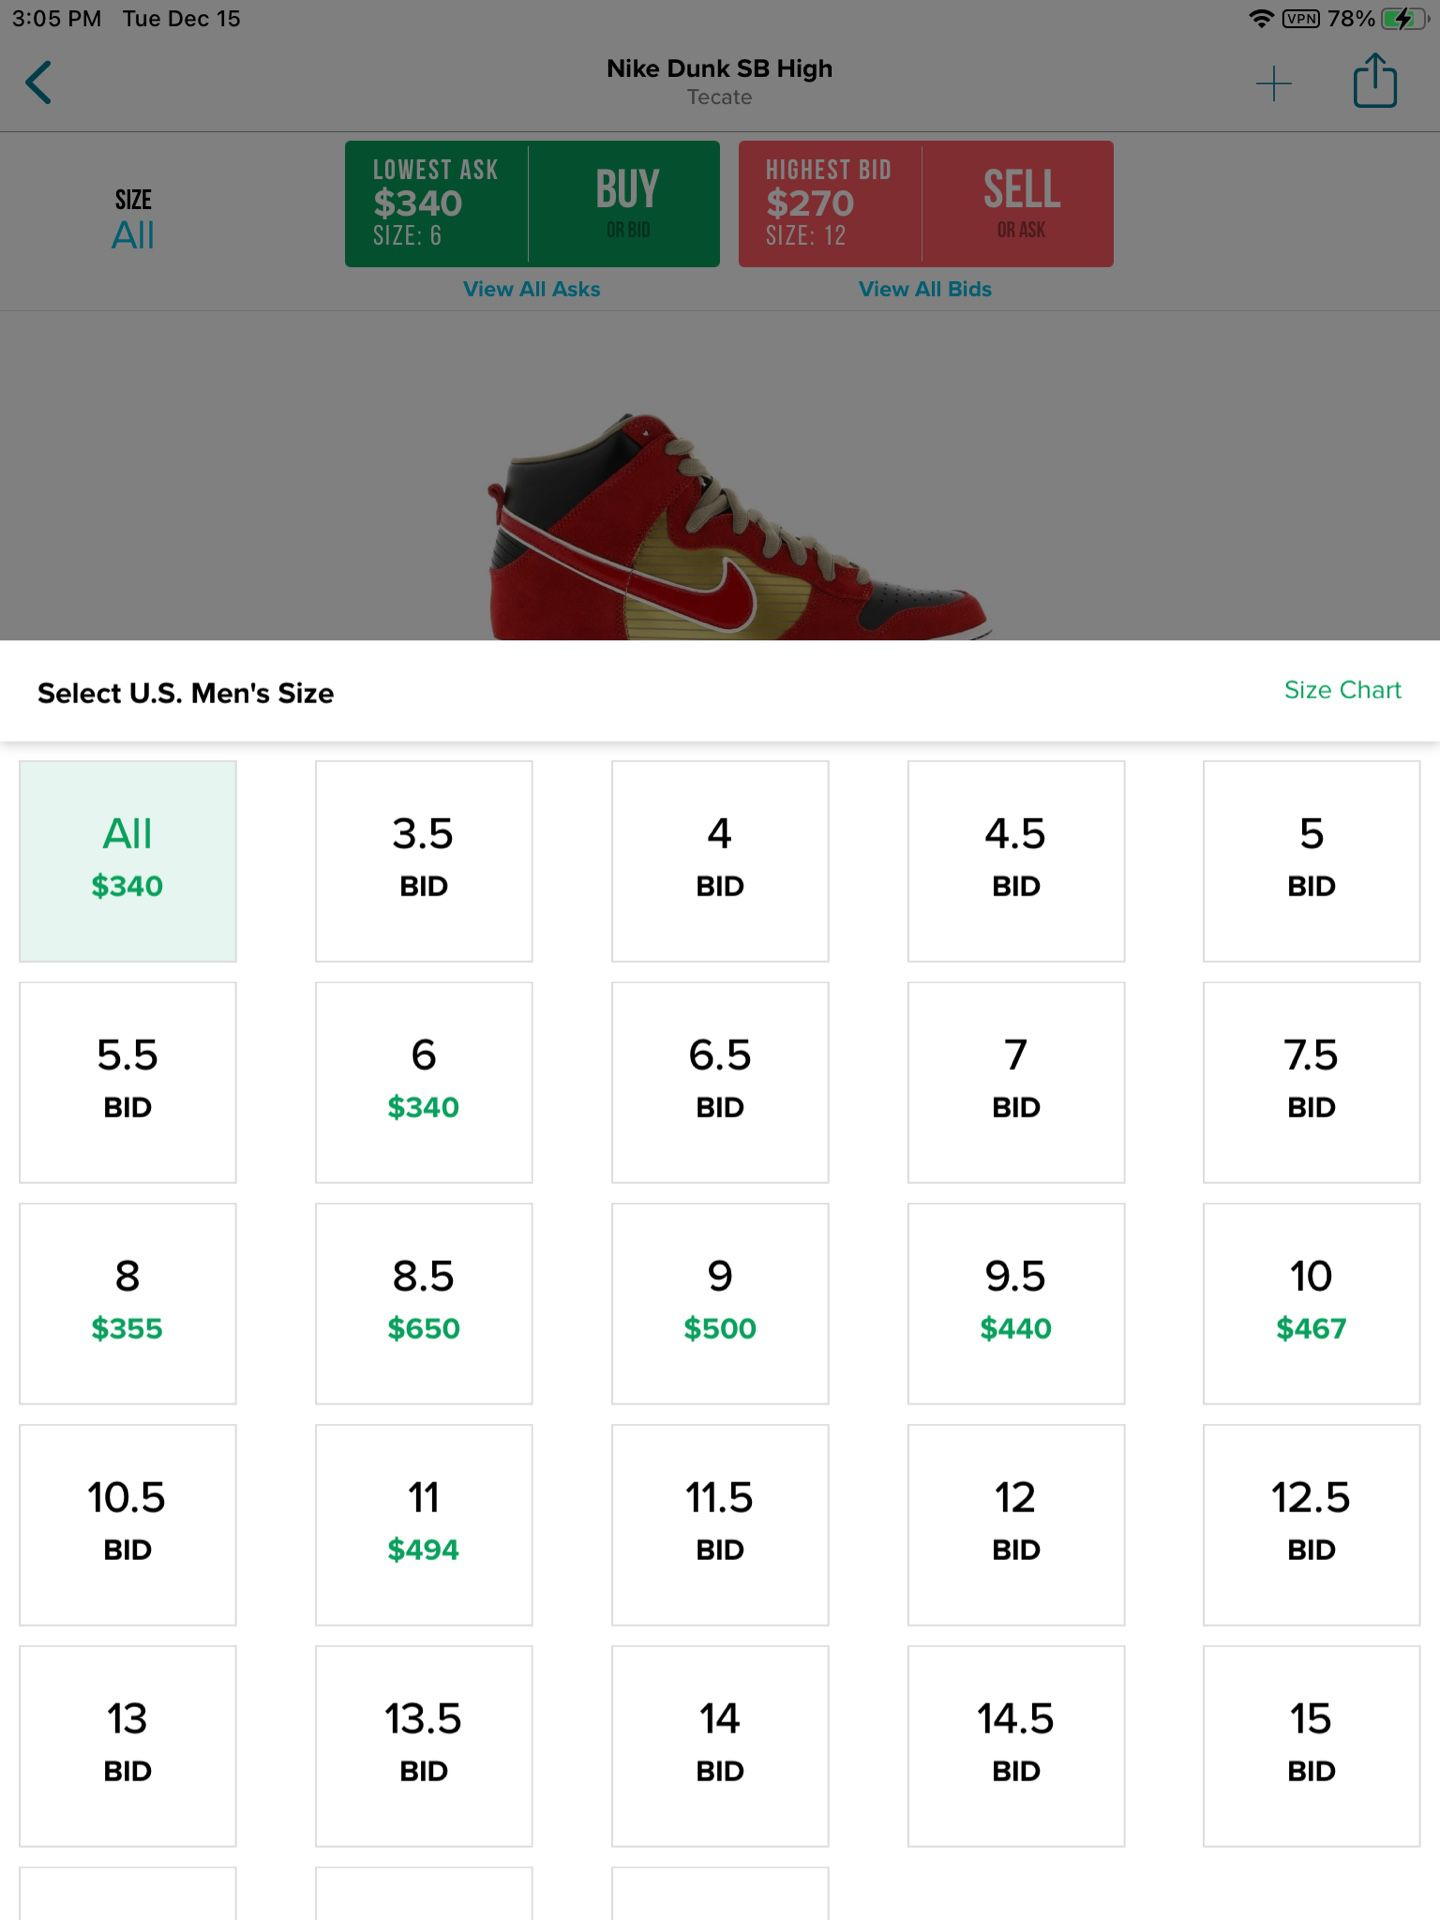 Nike SB Dunk High Tecate Size 12